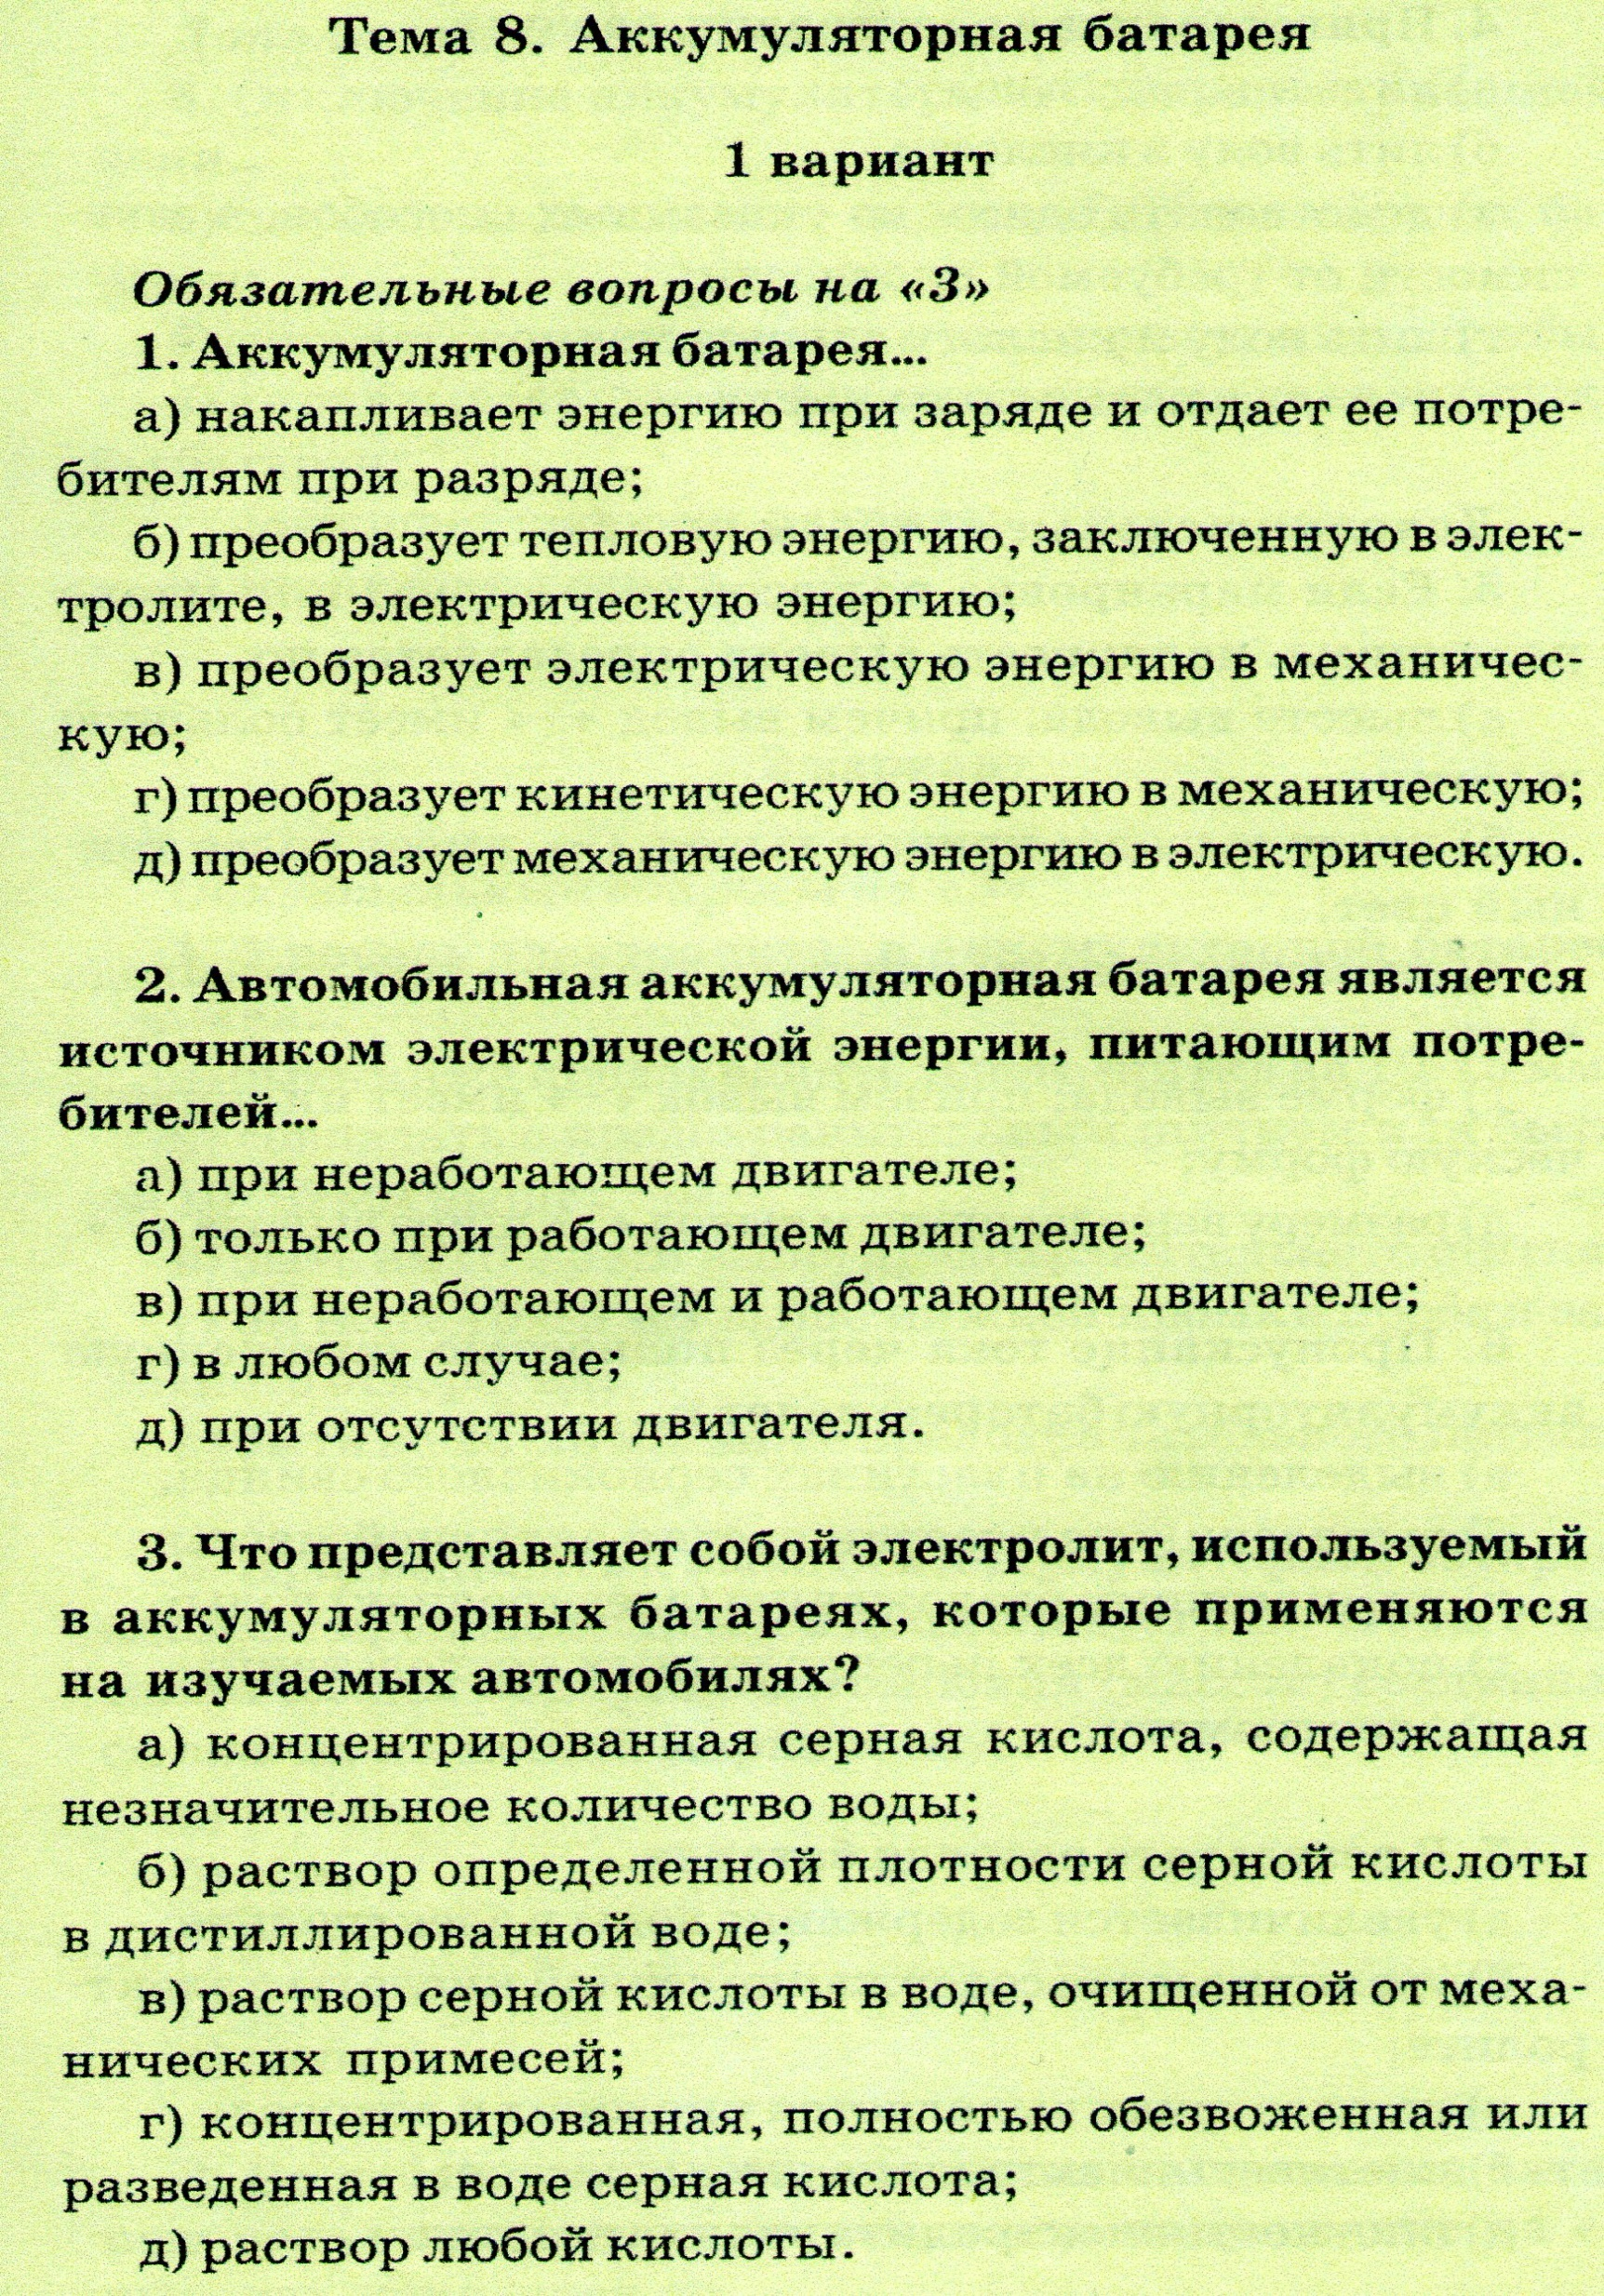 C:\Users\Василий Мельченко\Pictures\img541.jpg